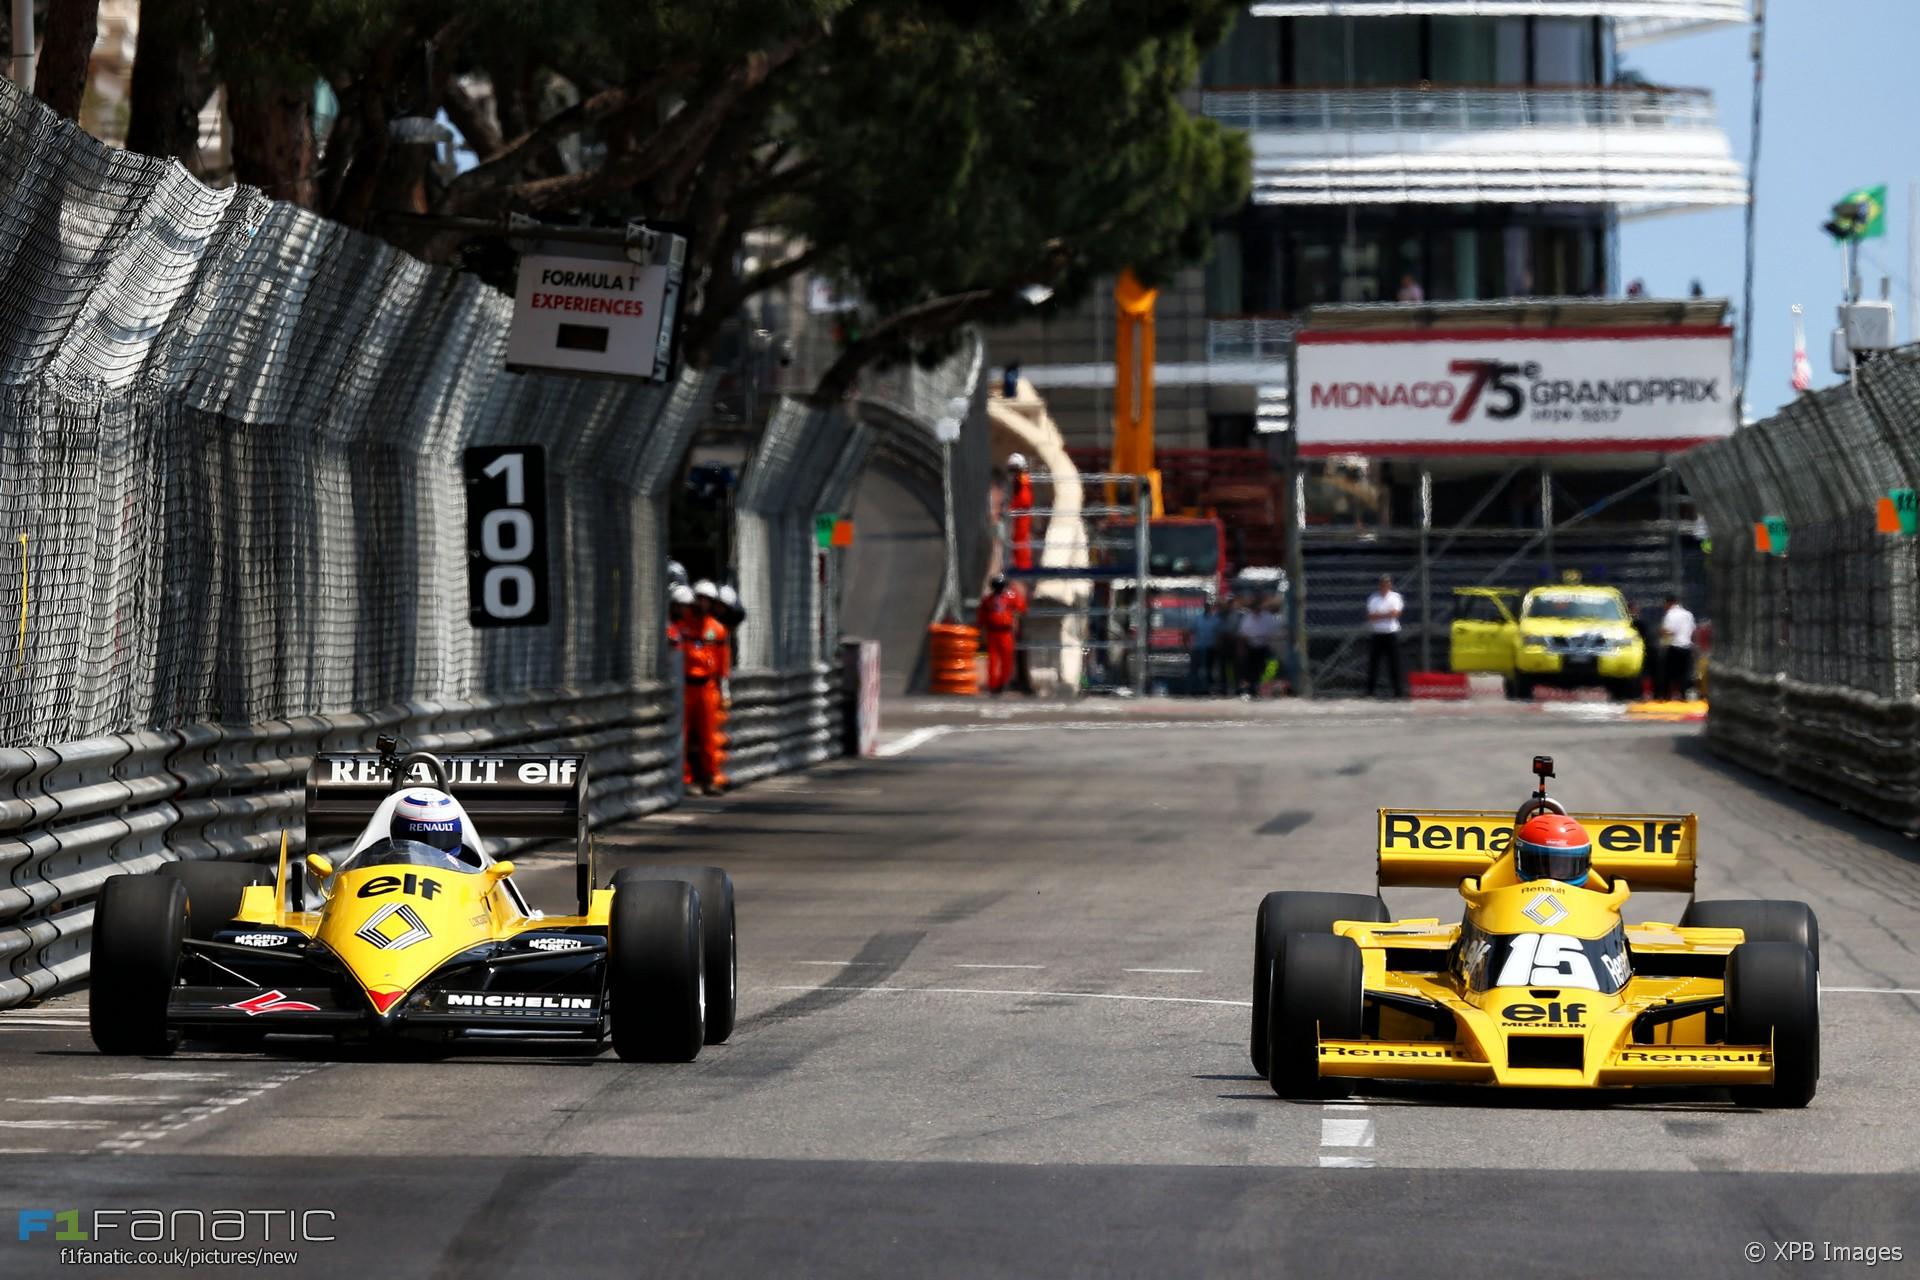 Alain Prost, Jean-Pierre Jabouille, Renault, Monaco, 2017